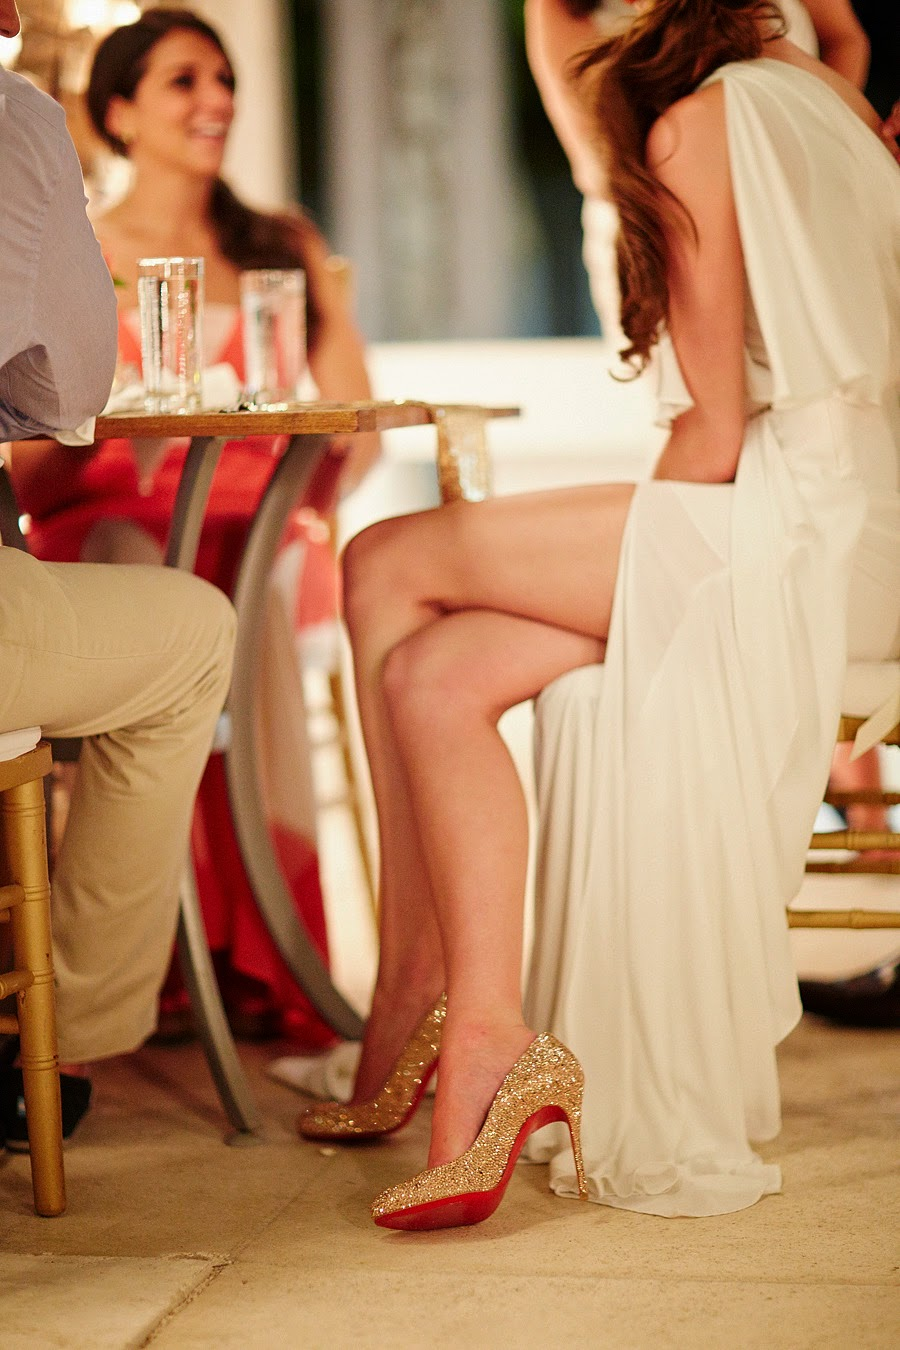 tavolino-bar-bar-buone-maniere-galateo-non-si-dice-piacere-blog-galateo